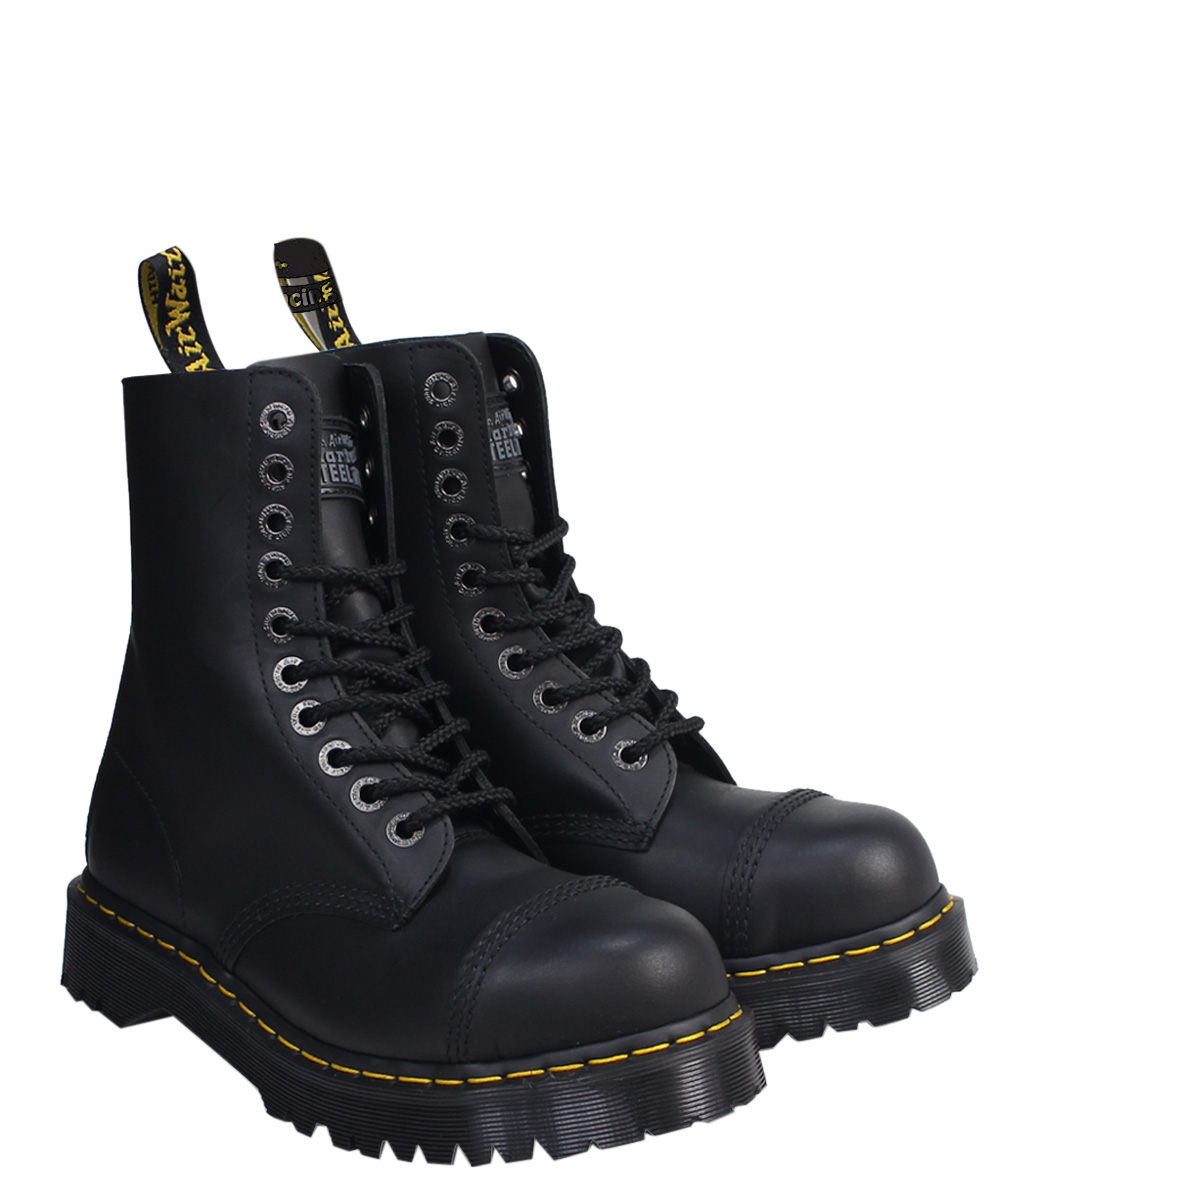 Dr.Martens 10EYE BOOT ドクターマーチン 8761 10ホール ブーツ R10966001 メンズ レディース